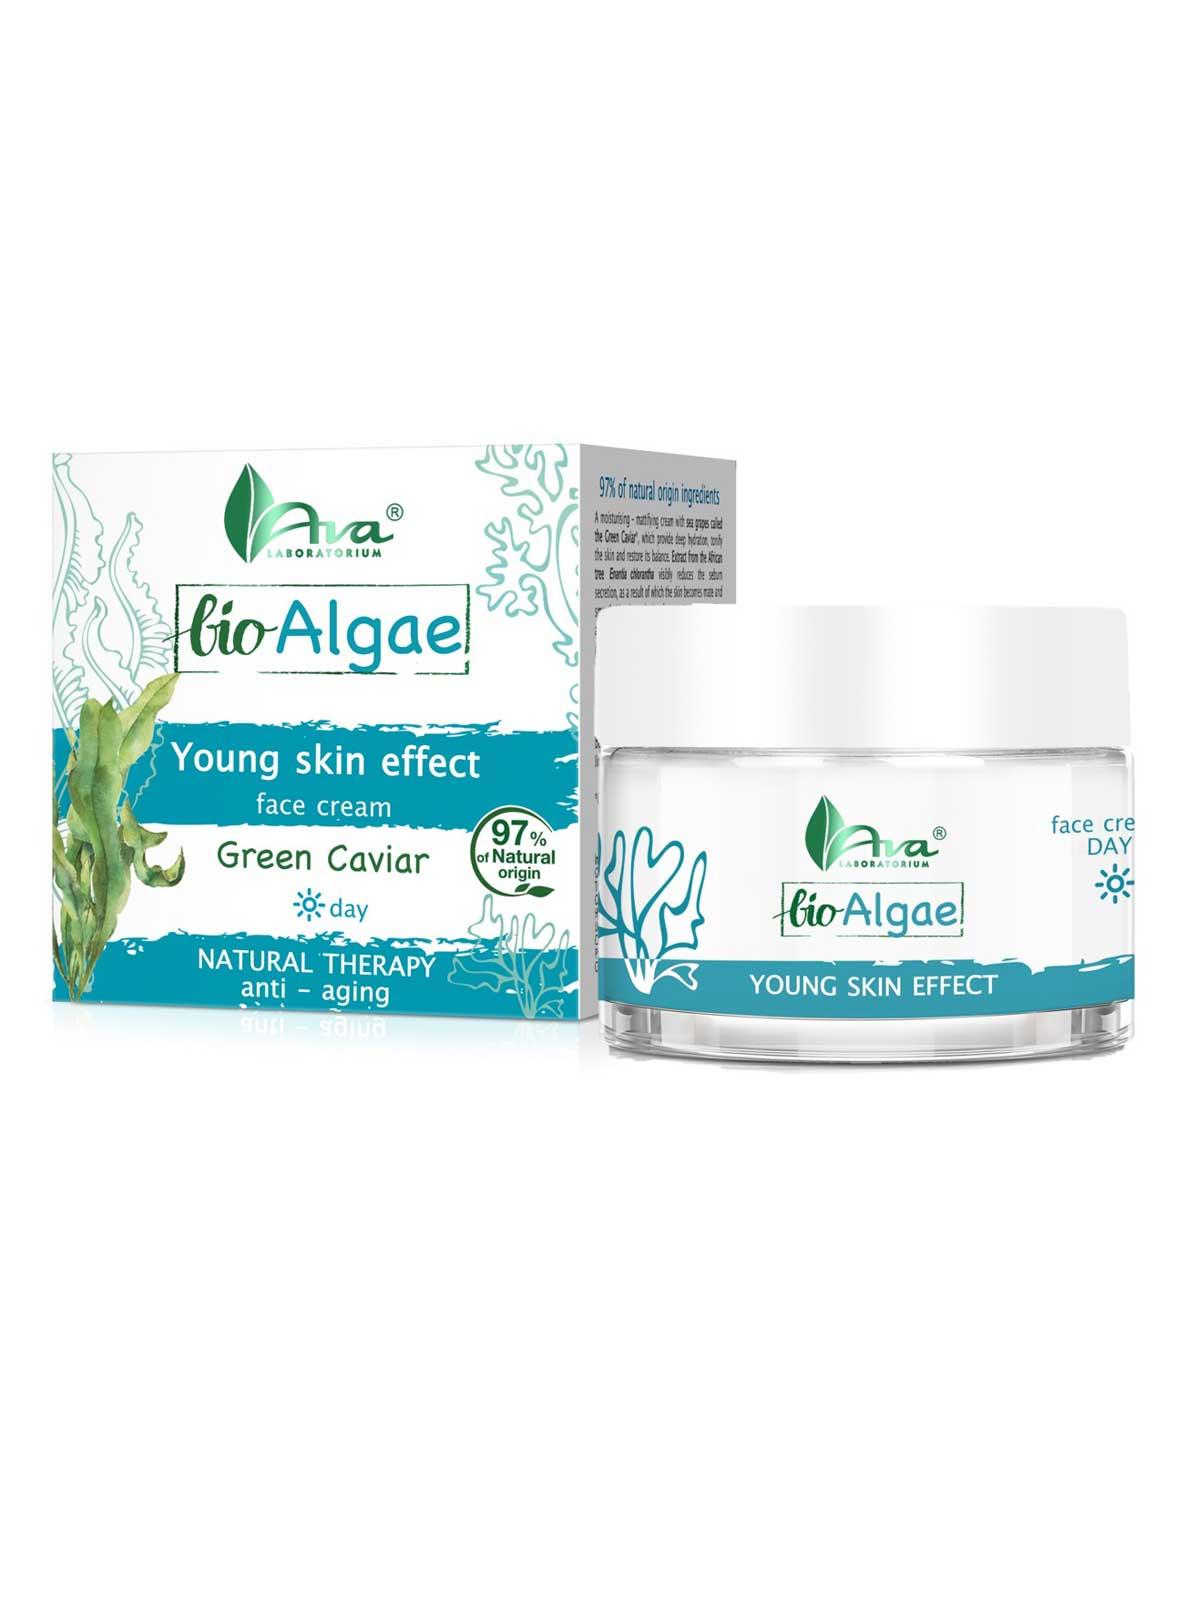 Bio-algae-green-caviar-day-cream-young-skin-effect-1200px1600px